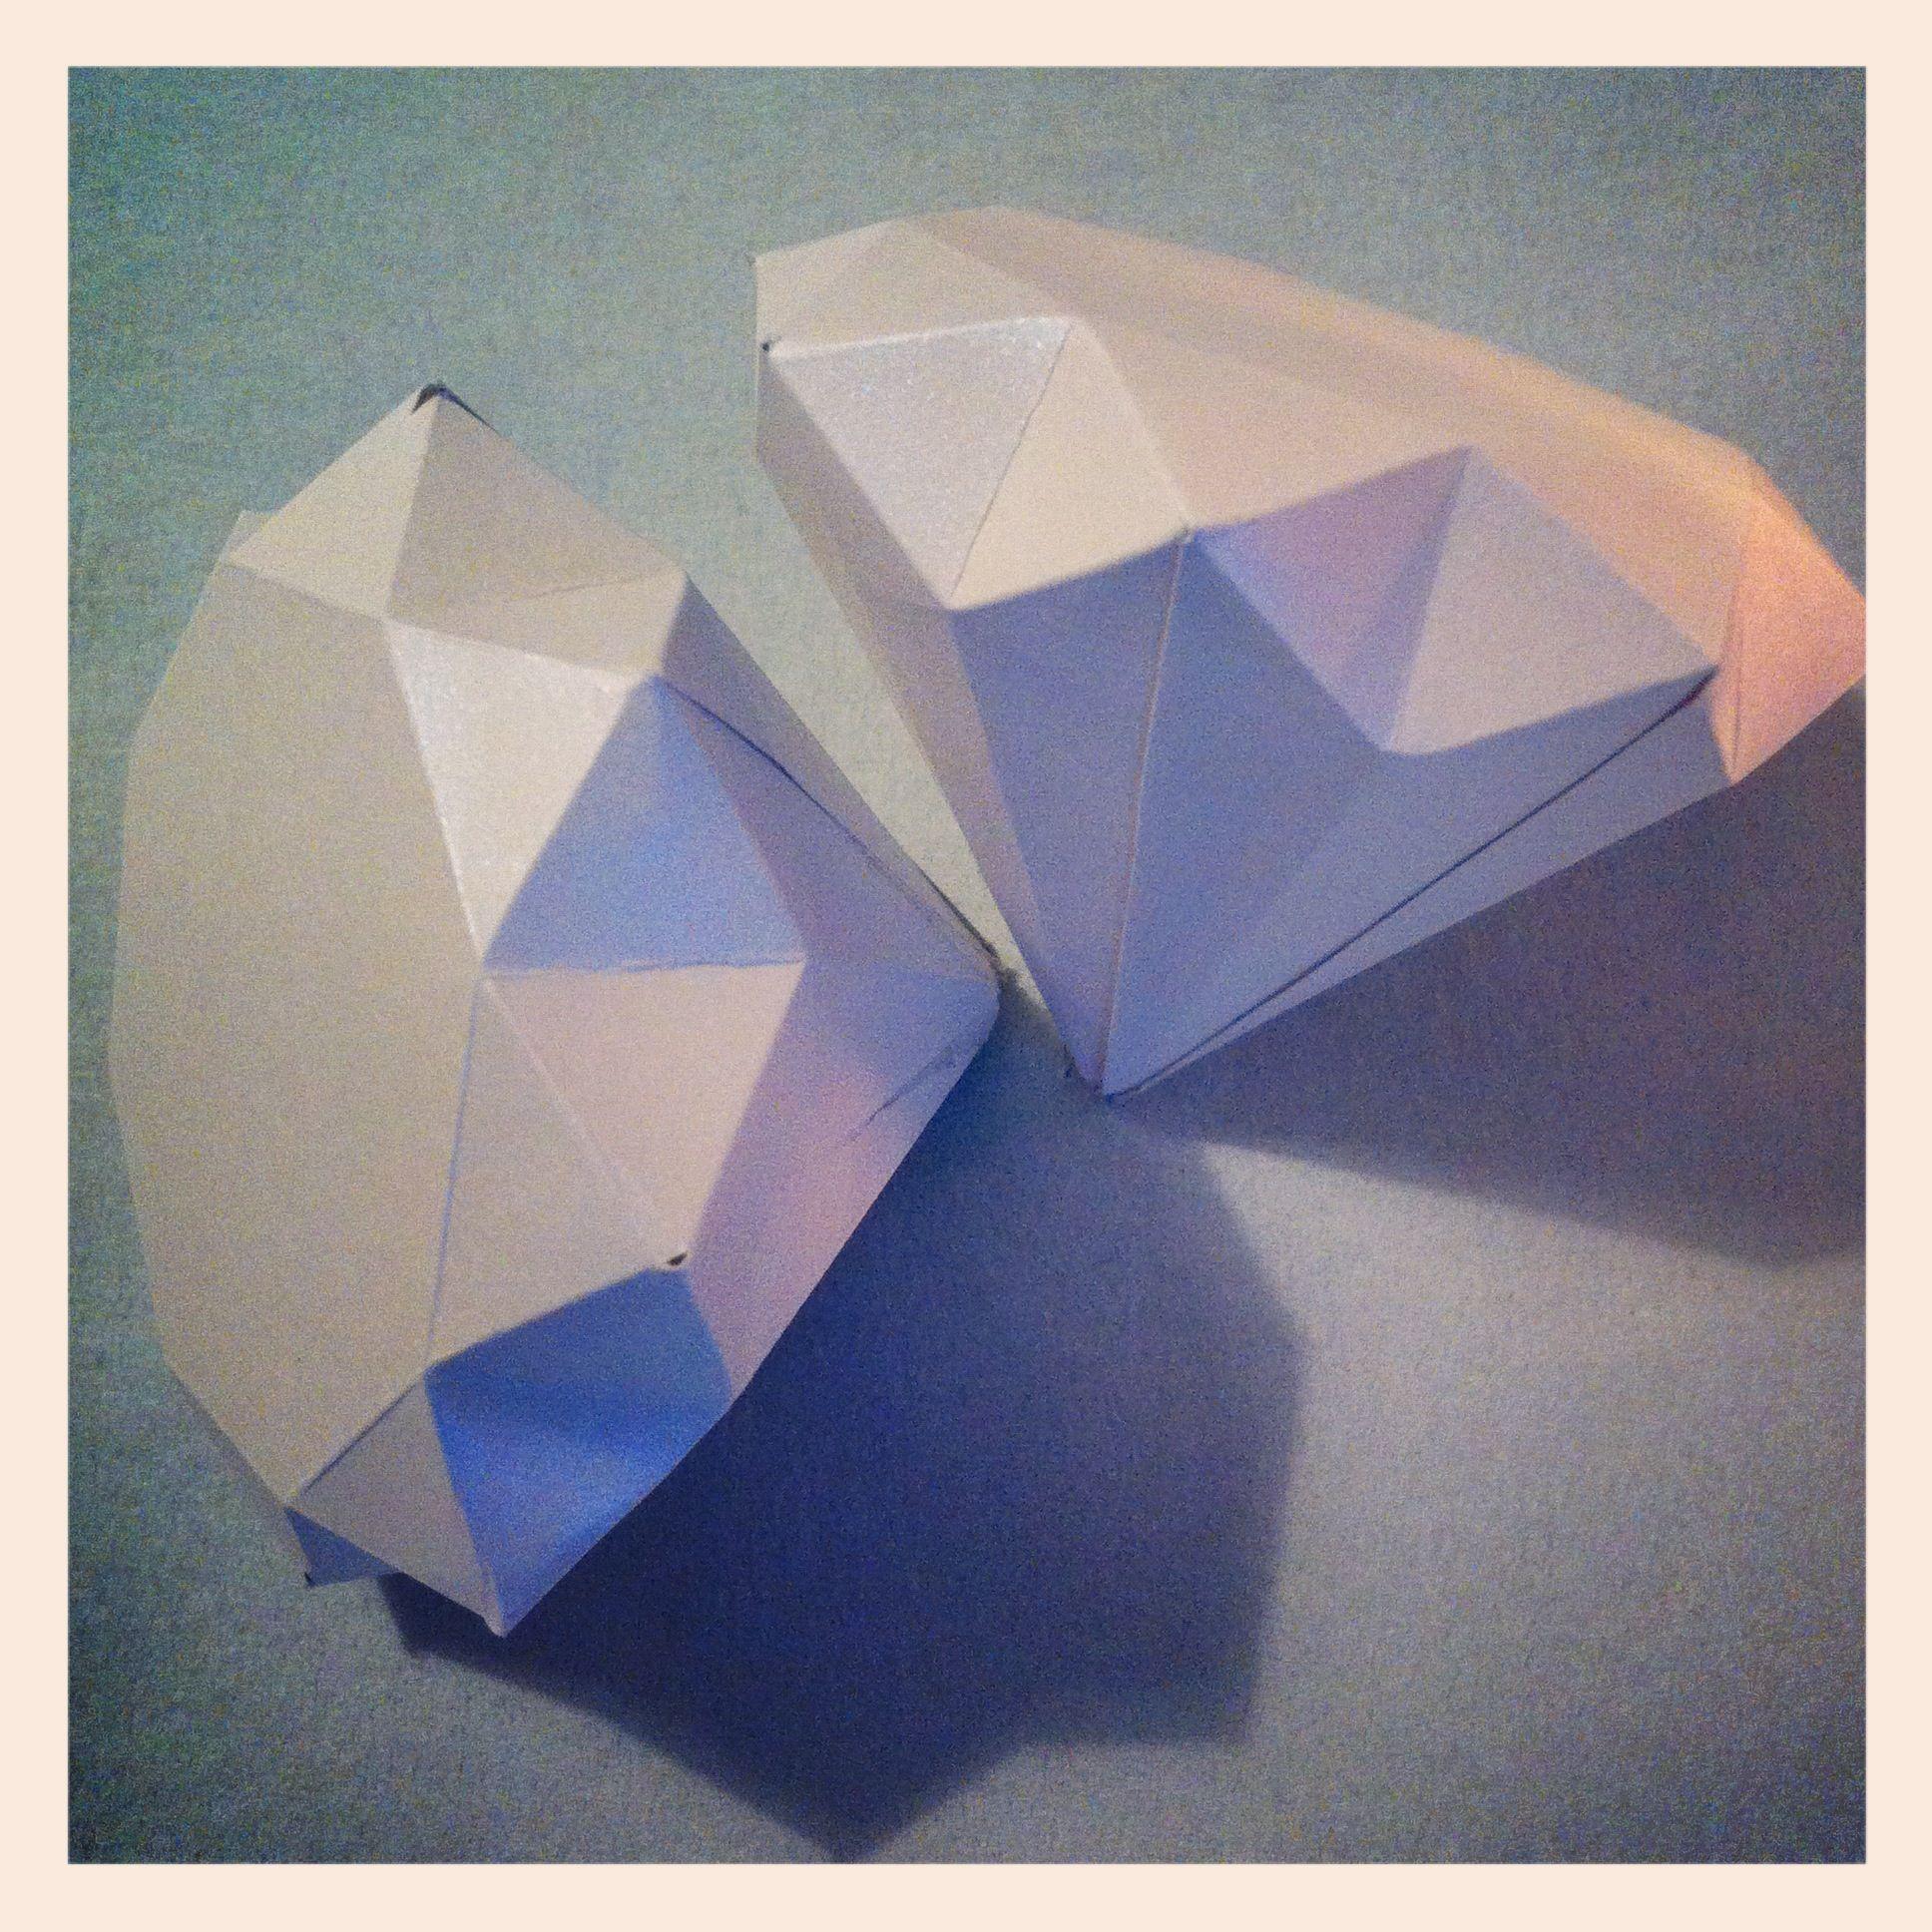 Diamond Wedding Anniversary Gifts For Grandparents: #Paper #Diamonds For My Grandparents 60th #Wedding